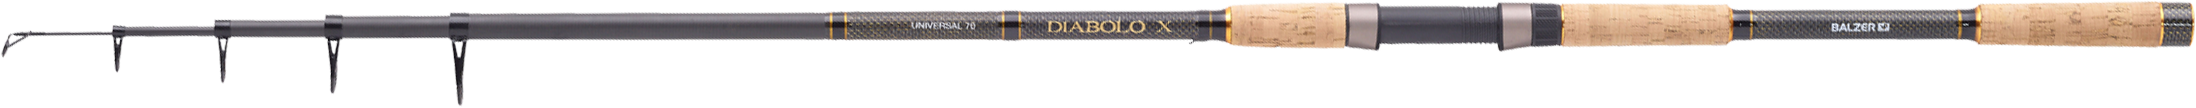 Diabolo X Tele Universal 70